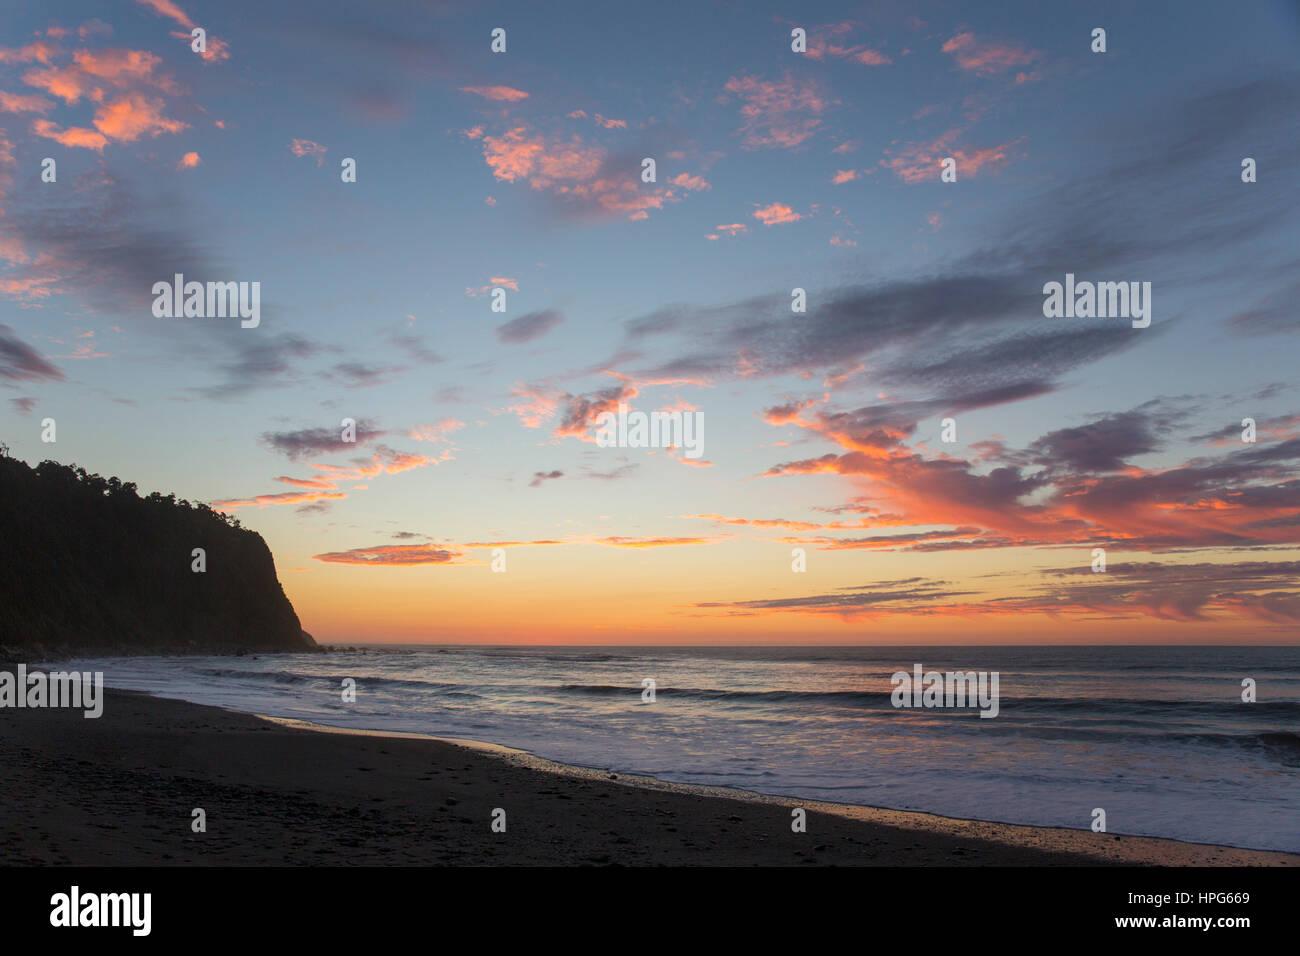 Okarito, Westland Tai Poutini Nationalpark, West Coast, New Zealand. Bunter Himmel über die Tasmanische See, Sonnenuntergang. Stockfoto